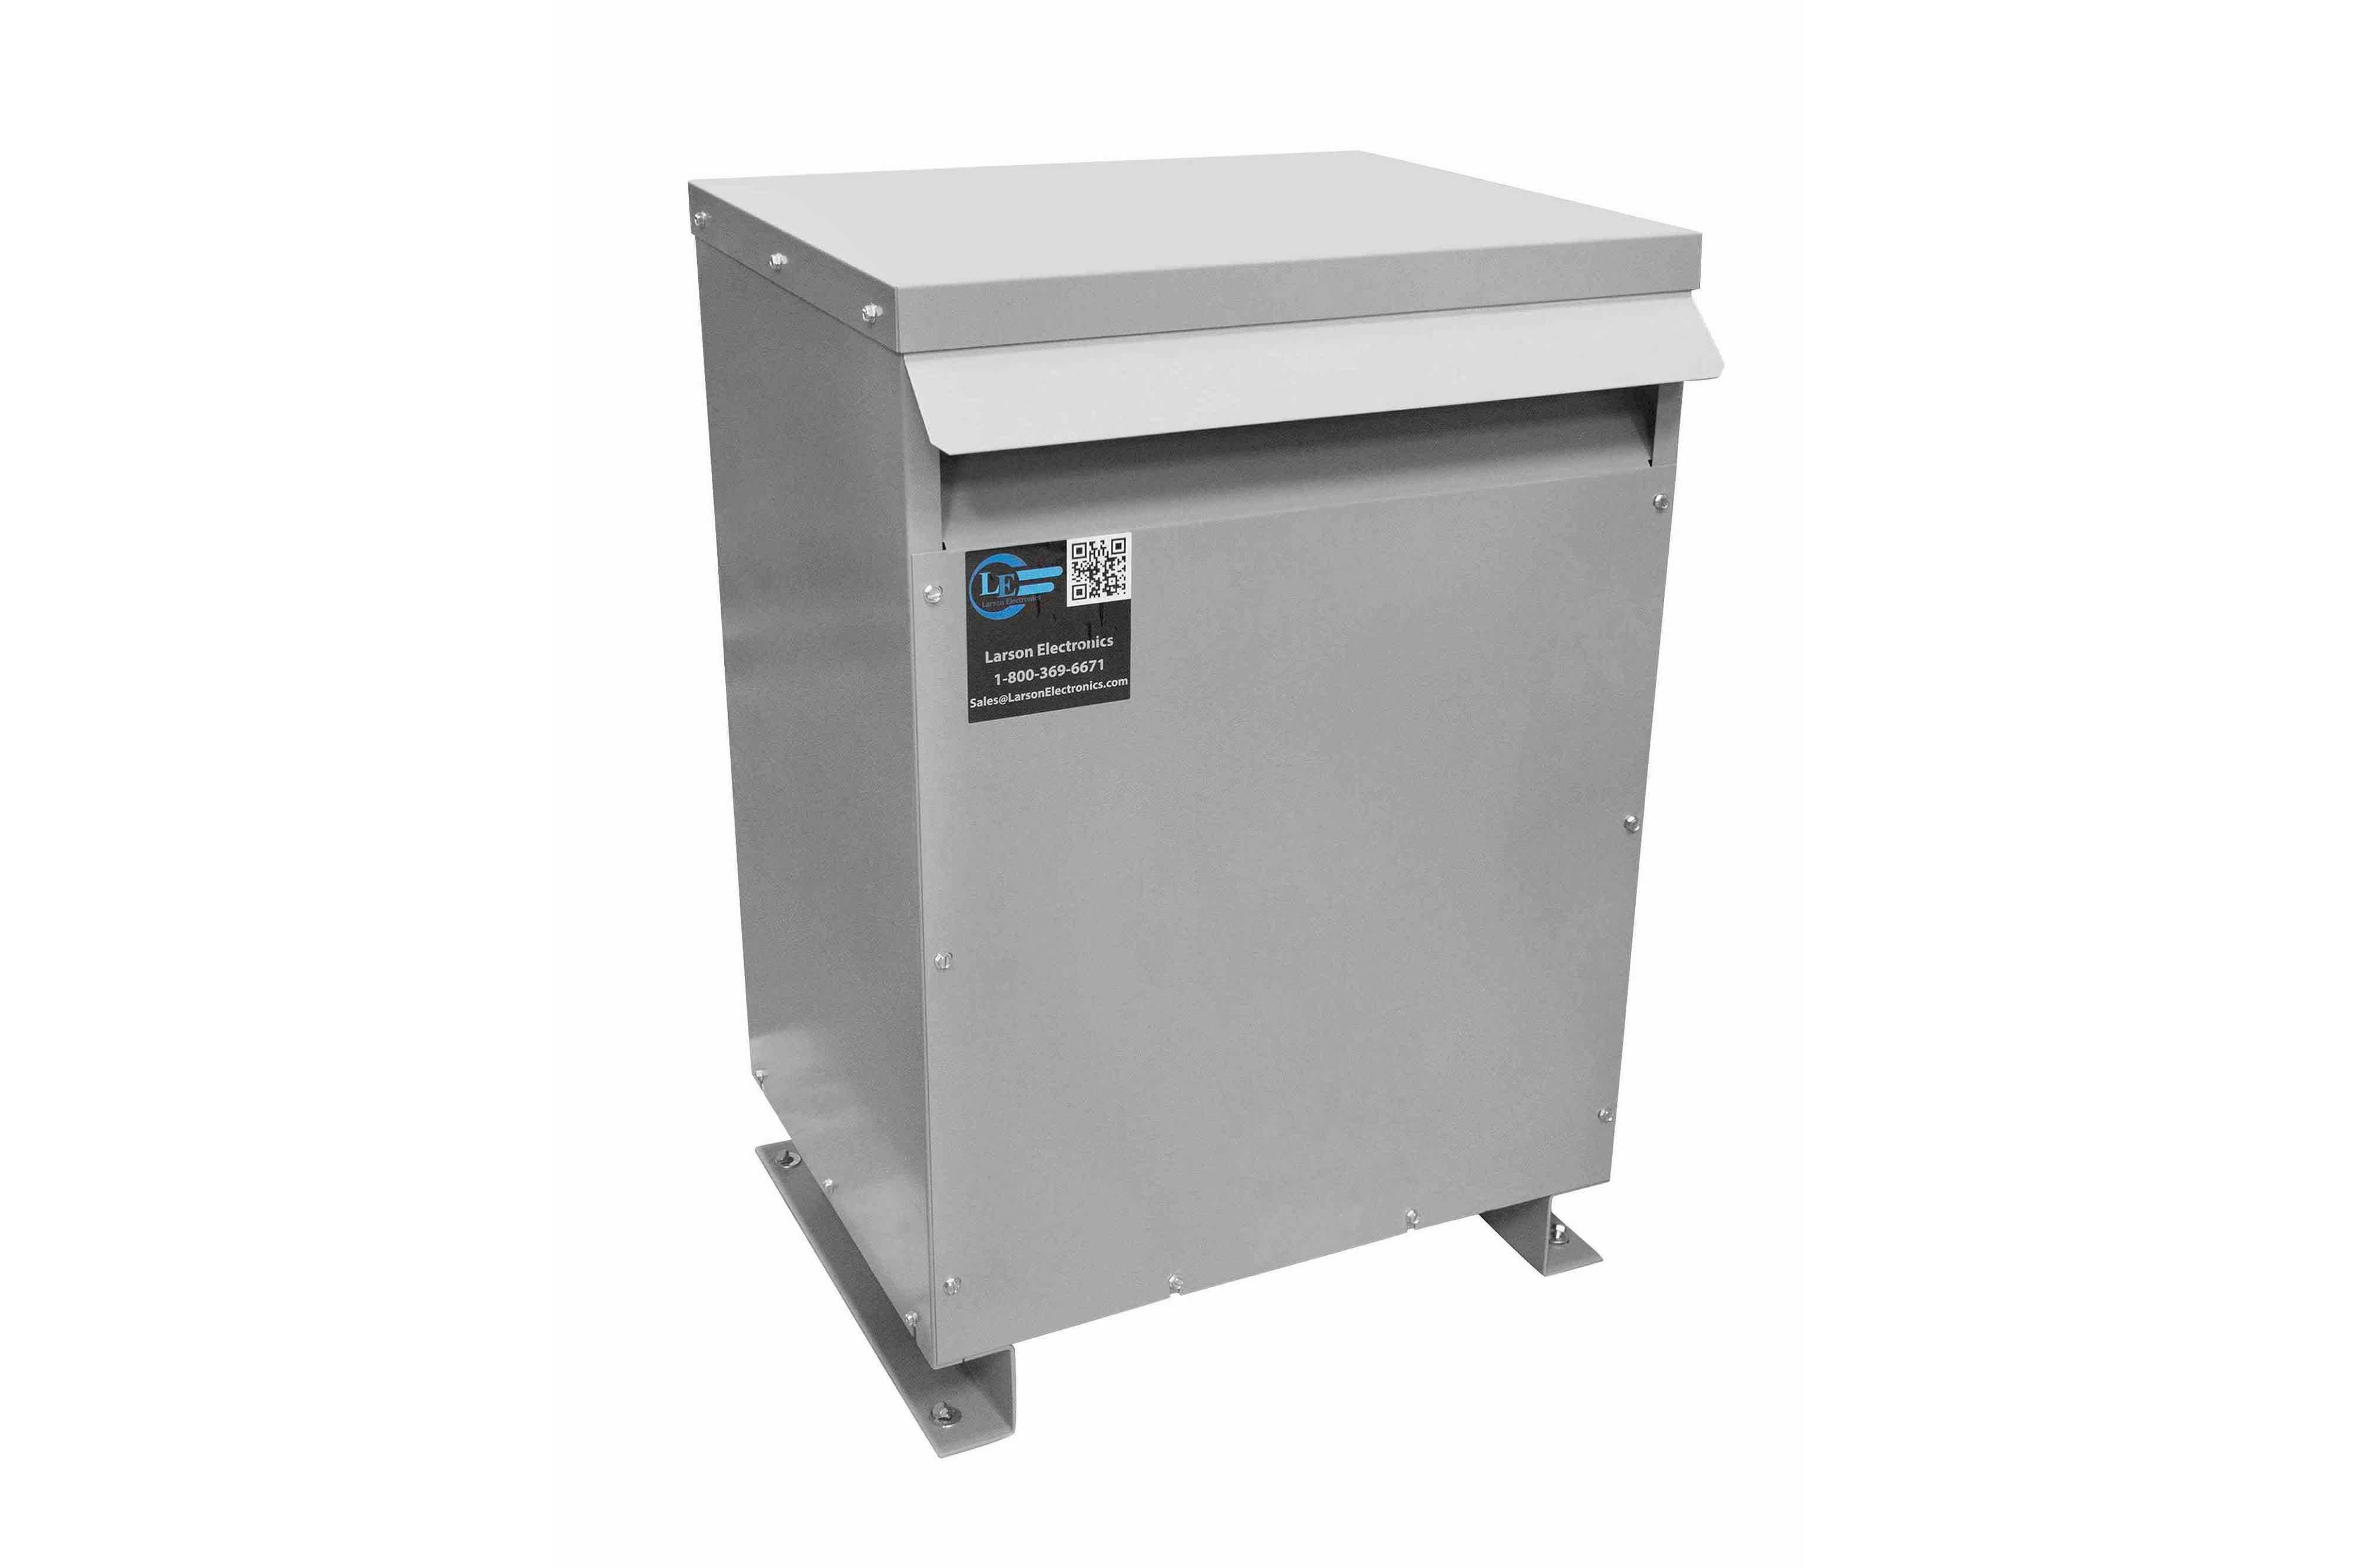 37.5 kVA 3PH Isolation Transformer, 600V Wye Primary, 460V Delta Secondary, N3R, Ventilated, 60 Hz